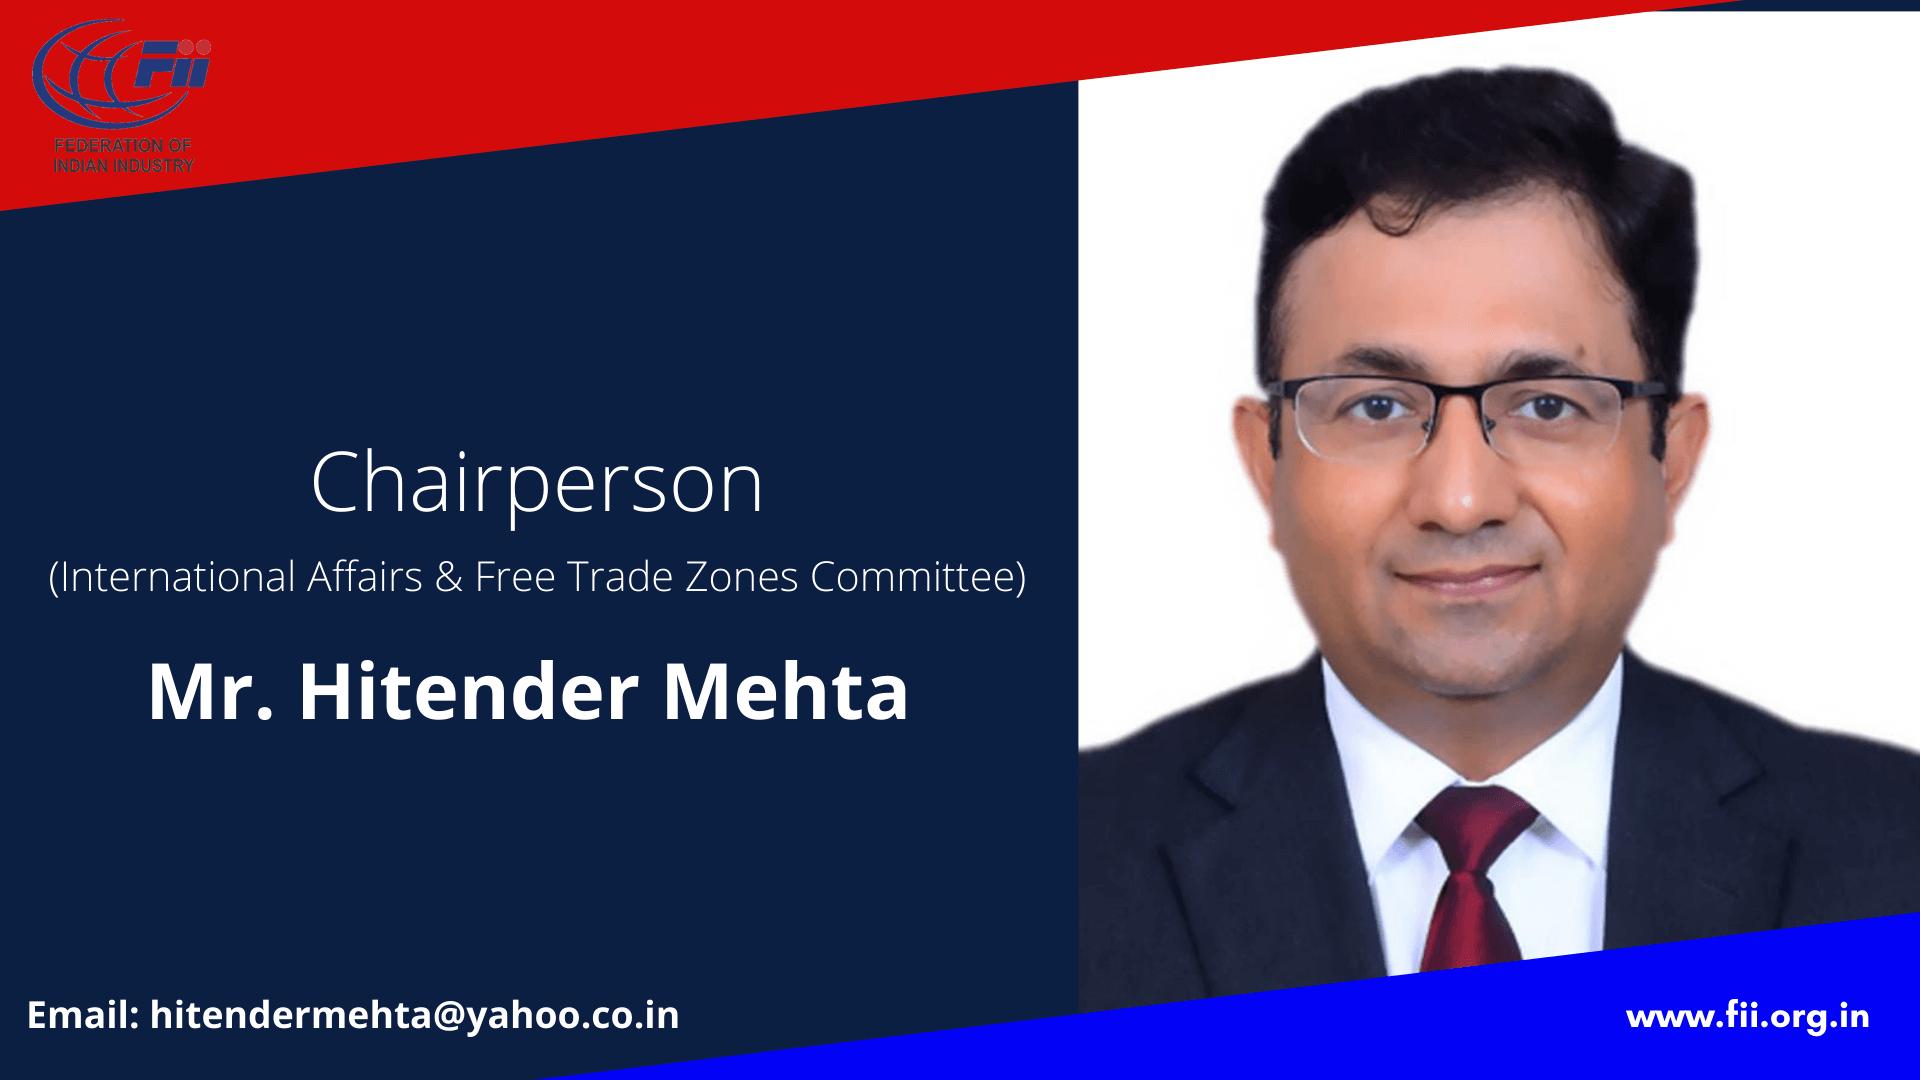 Mr. Hitender Mehta Chairperson, International Affairs & Free Trade Zones Committee